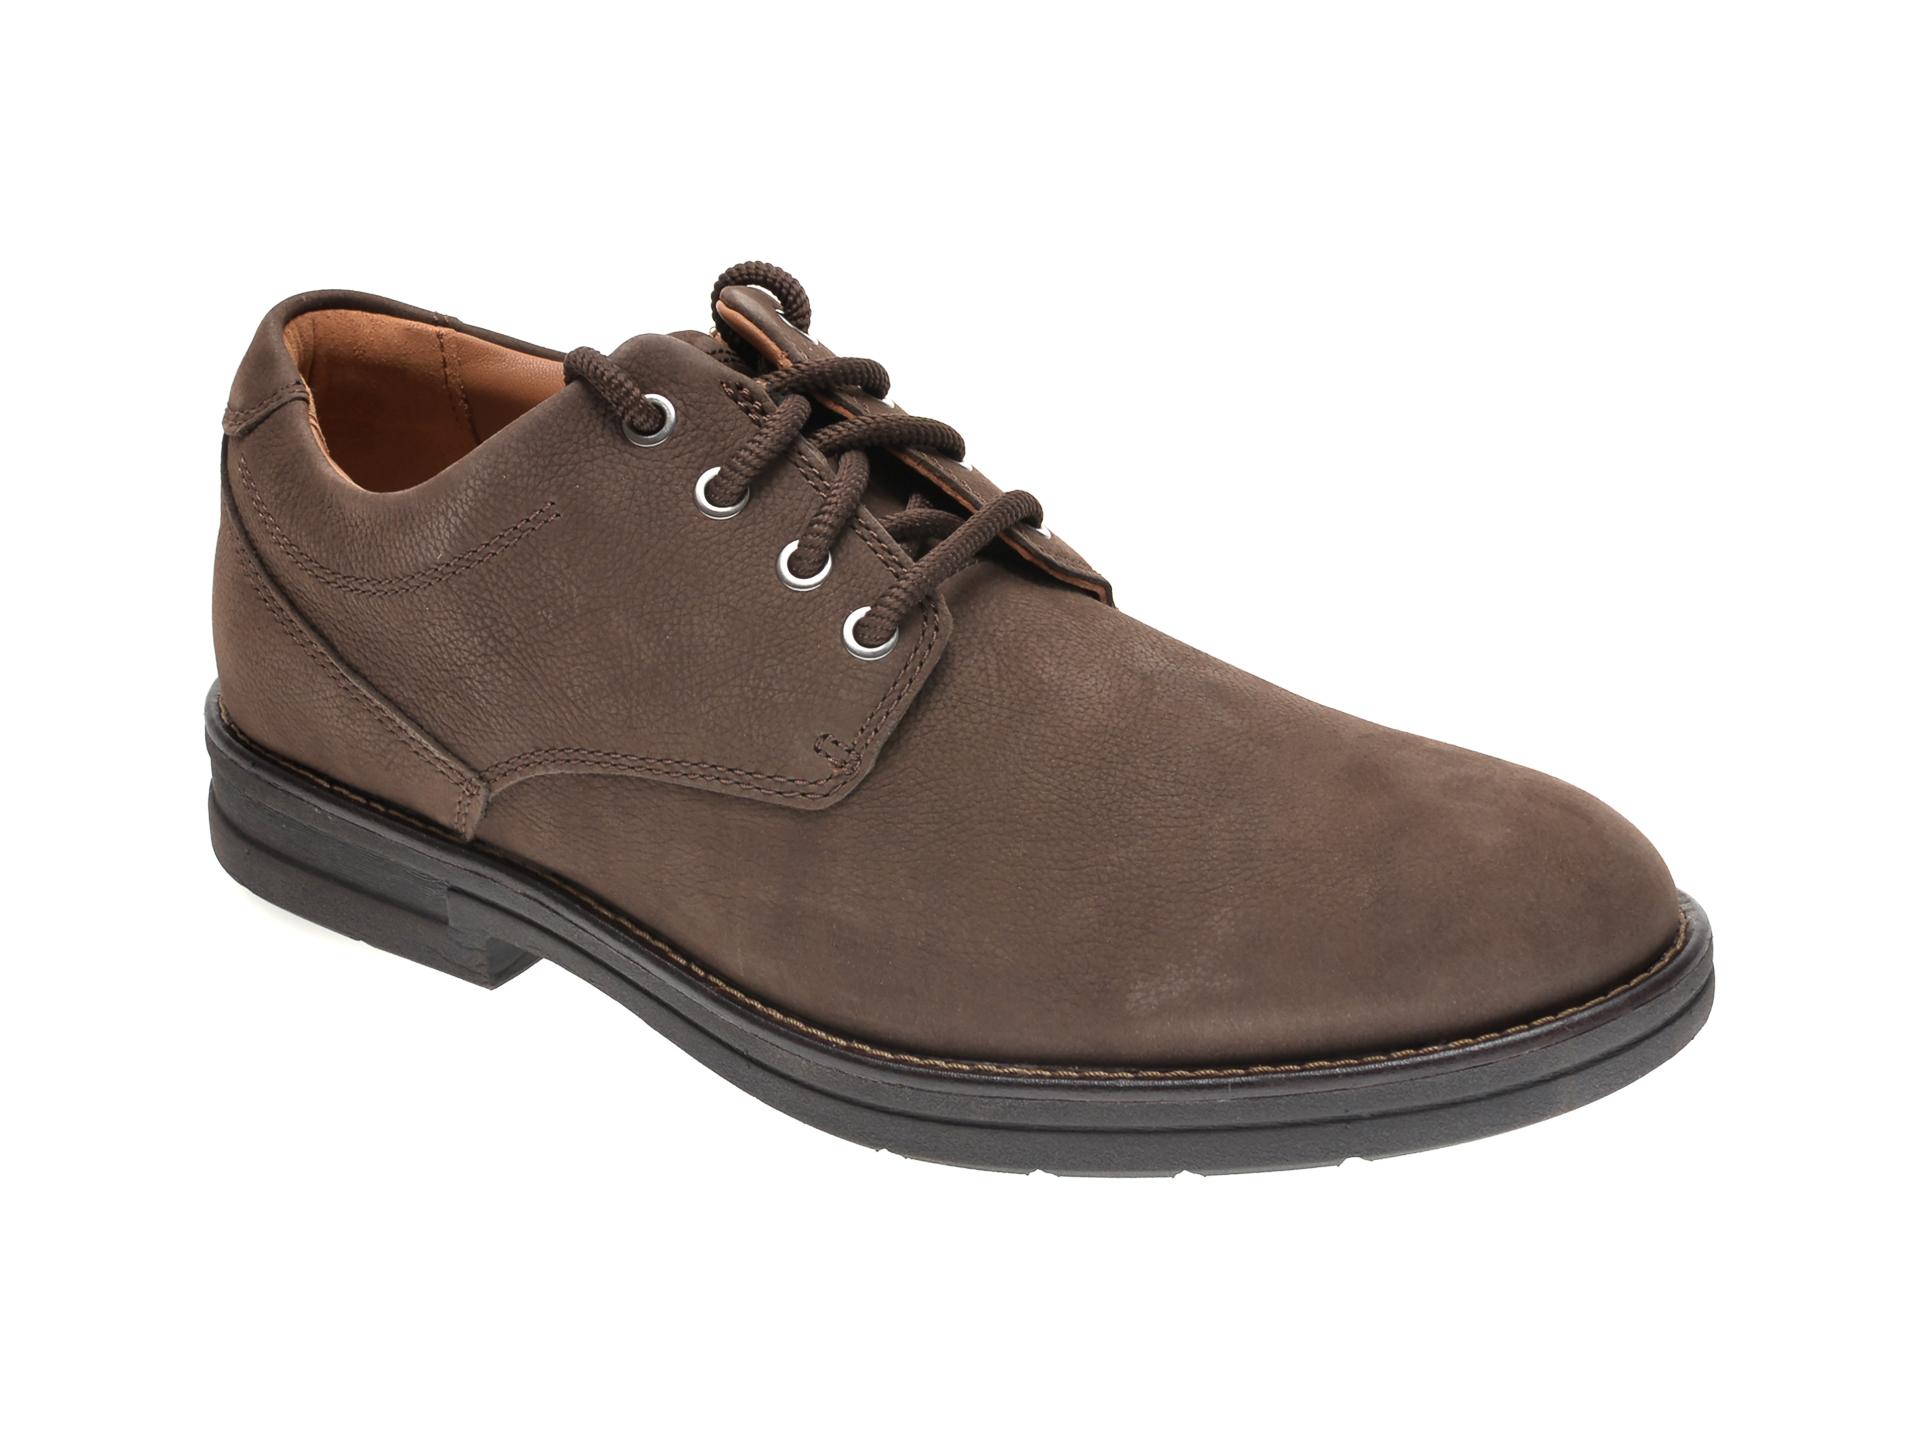 Pantofi CLARKS maro, BANNING PLAIN, din nabuc imagine